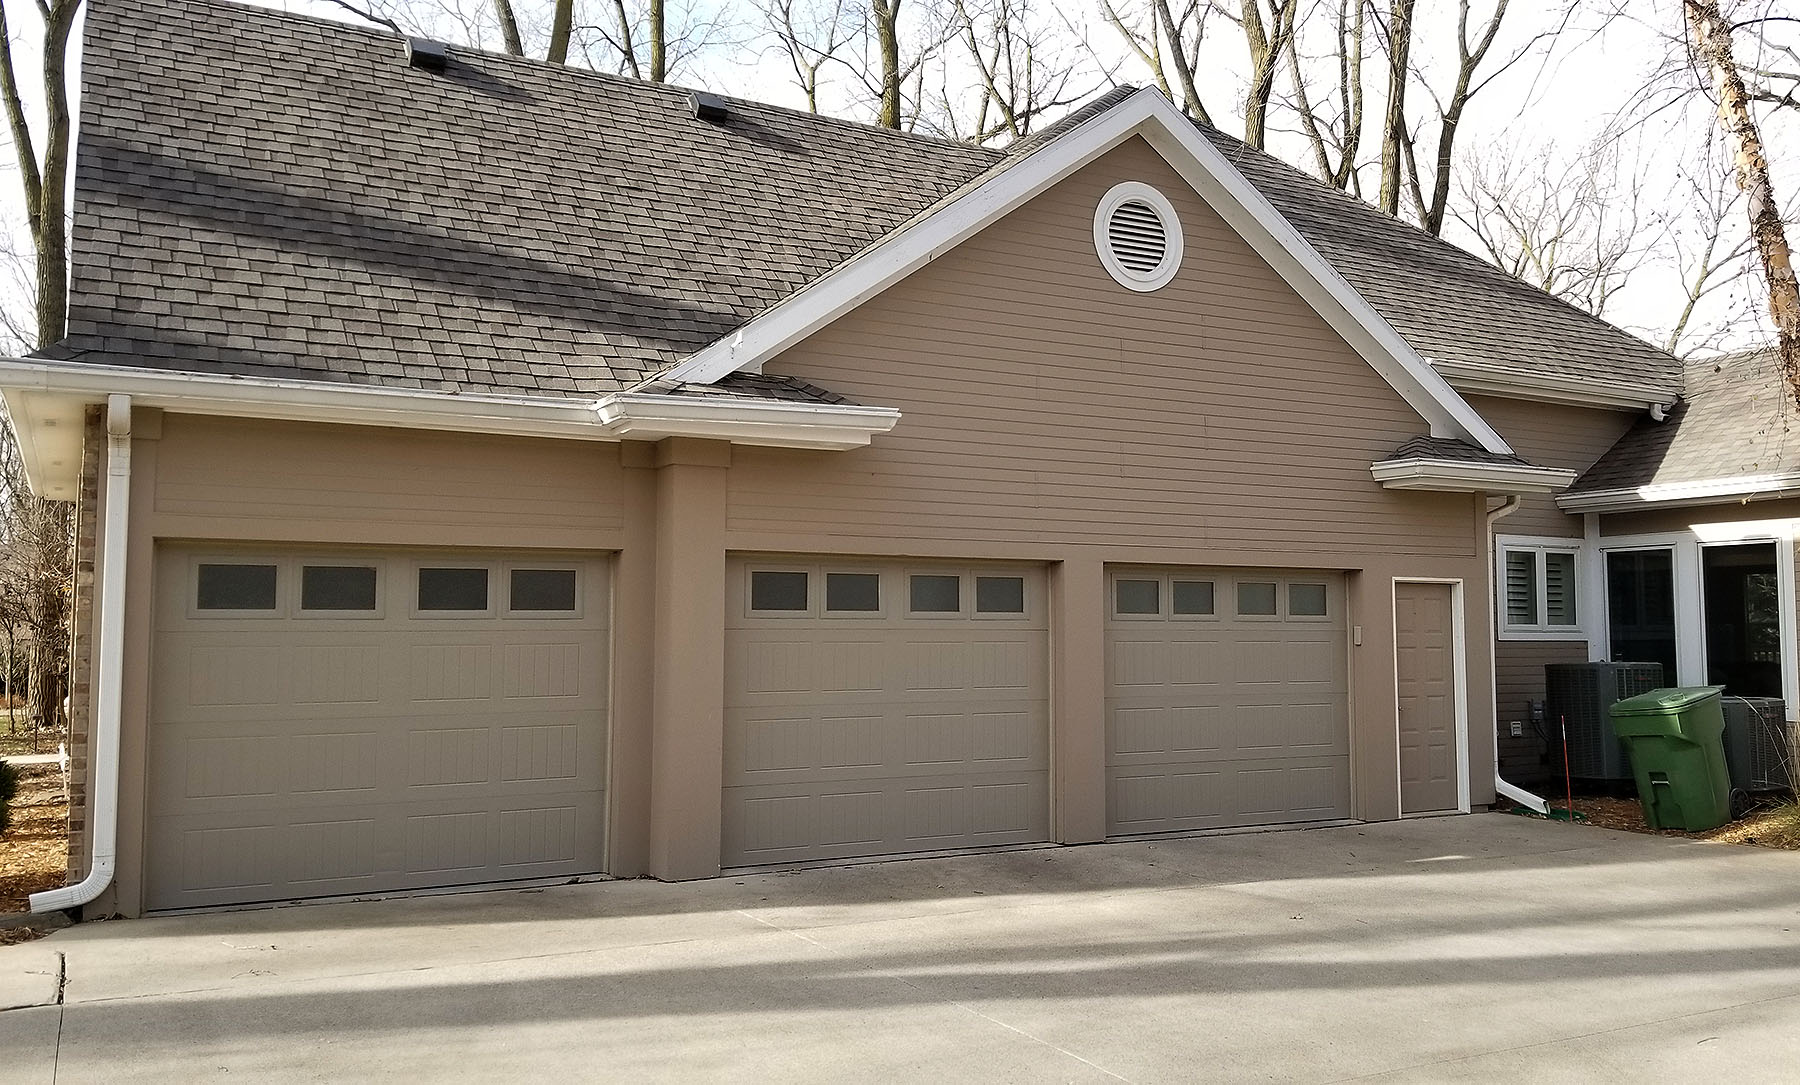 Garage door sale service and repair why installing insulated garage doors makes sense rubansaba